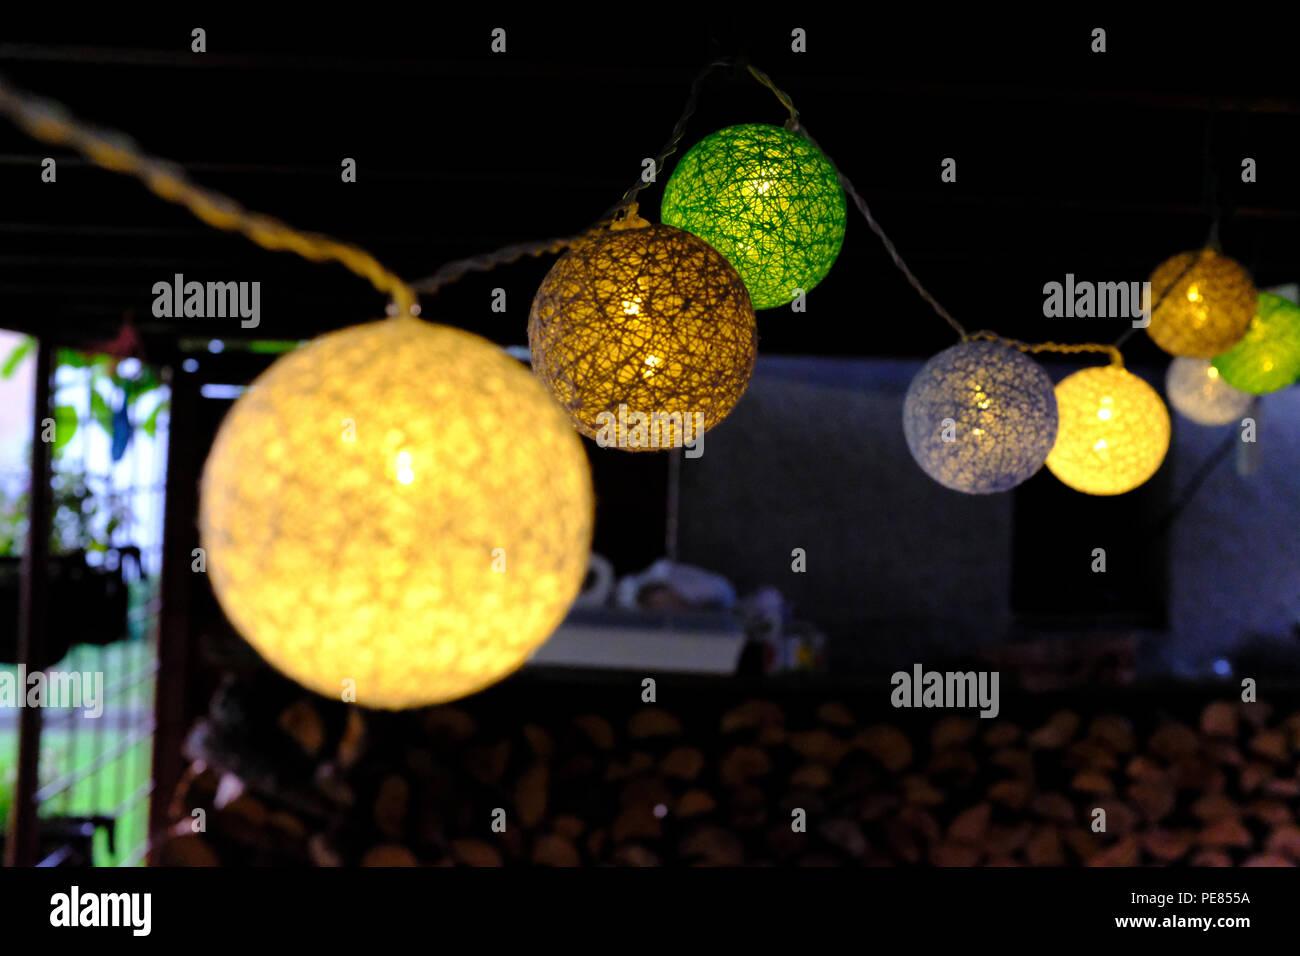 Solar garden lights at night time - Stock Image